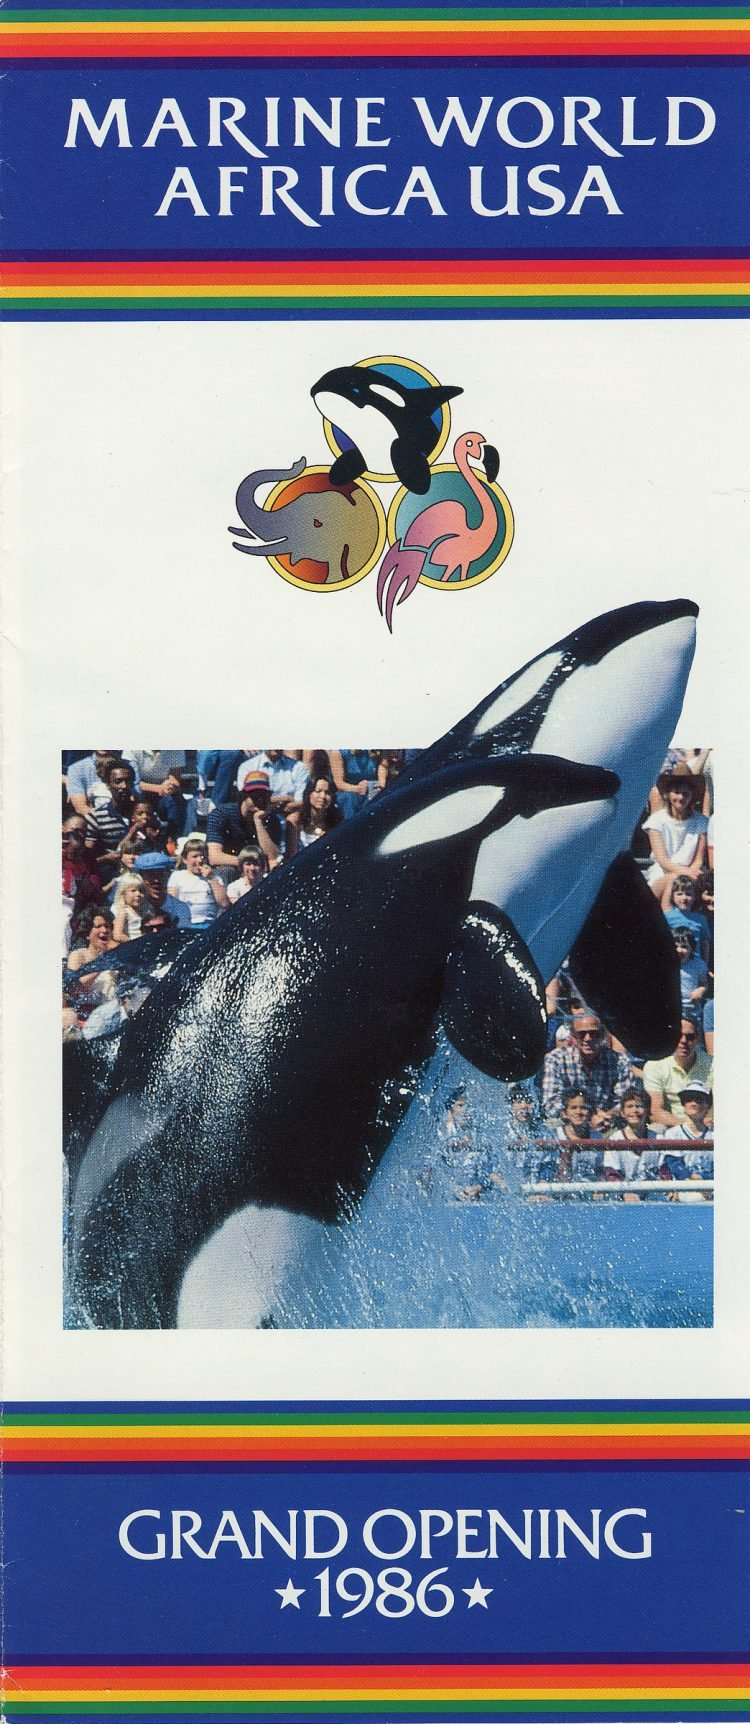 Marine World Africa USA - Grand Opening brochure 1986 (4)